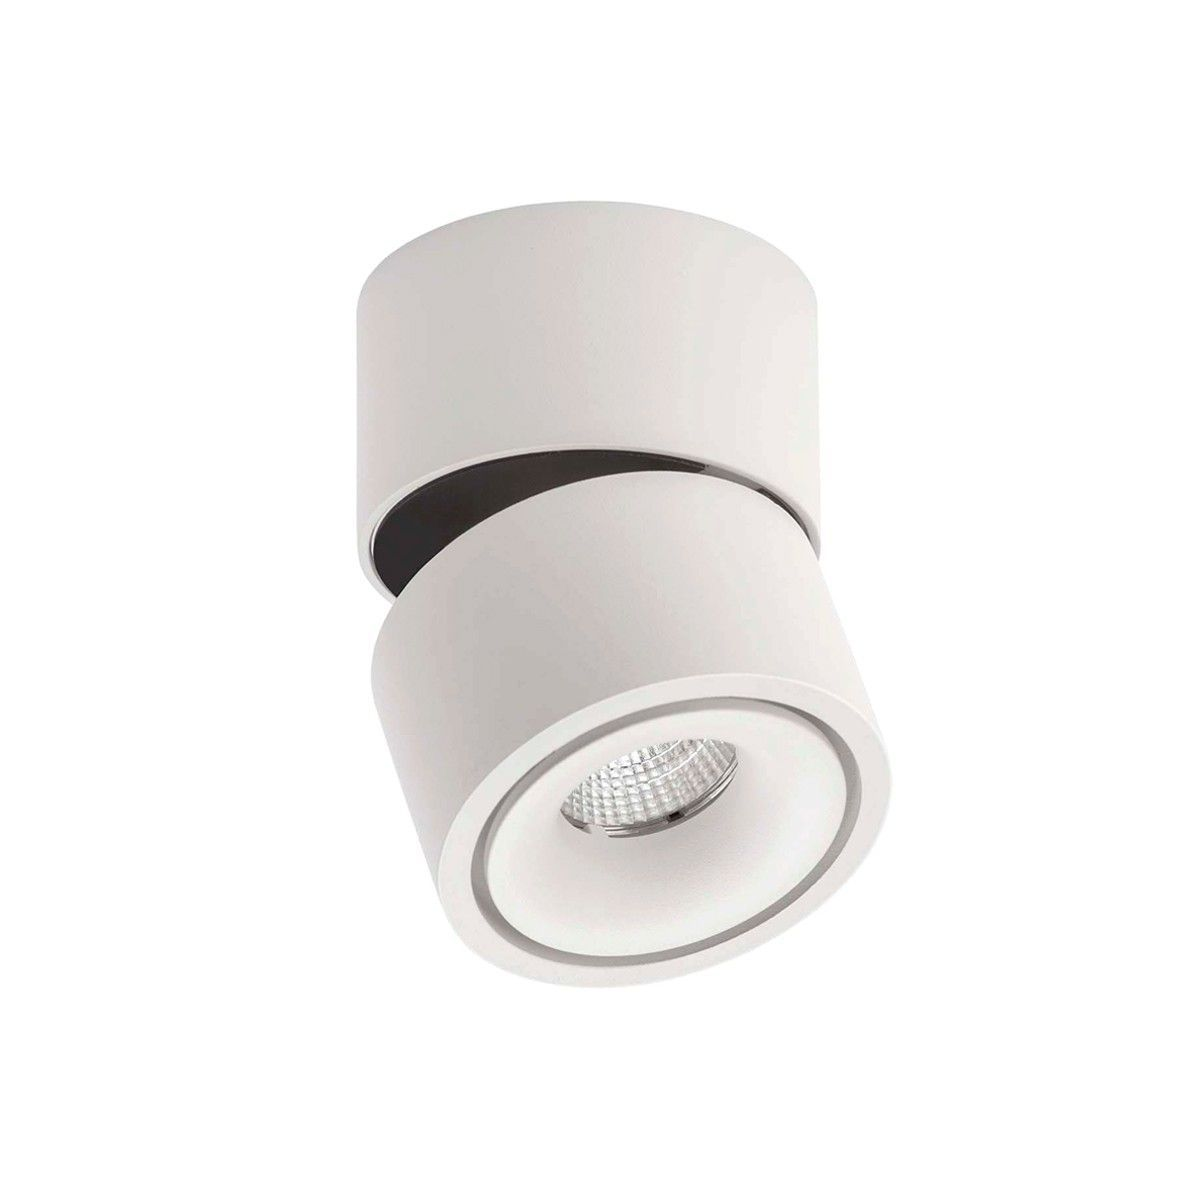 Badbeleuchtung Led Rgb Indirekte Beleuchtung Schlafzimmer Bett Decke Badbeleuchtung Beleuchtung In 2020 Indirekte Beleuchtung Beleuchtung Badezimmerbeleuchtung